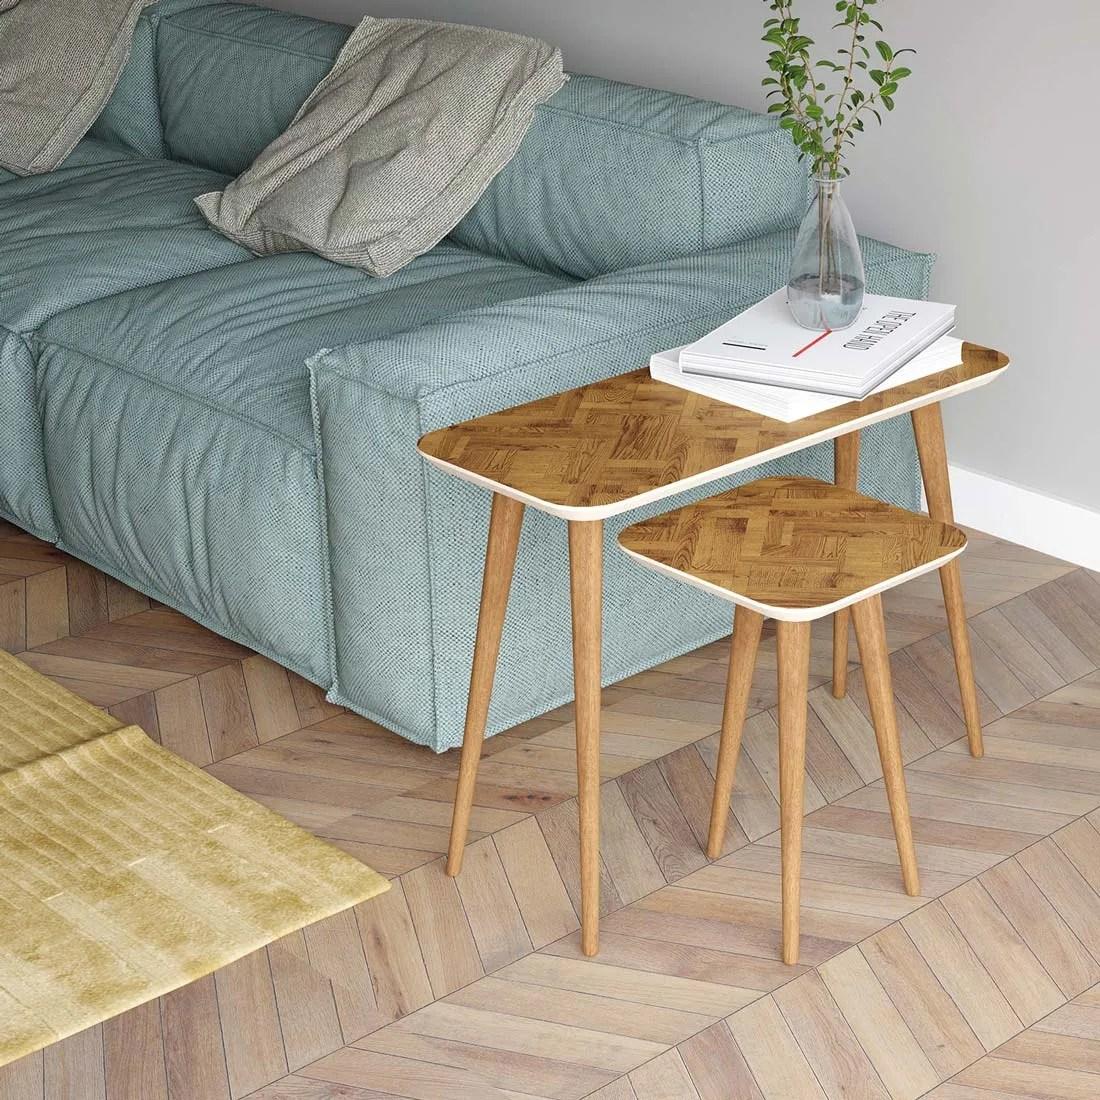 mesas-laterales-modernas-marche-2